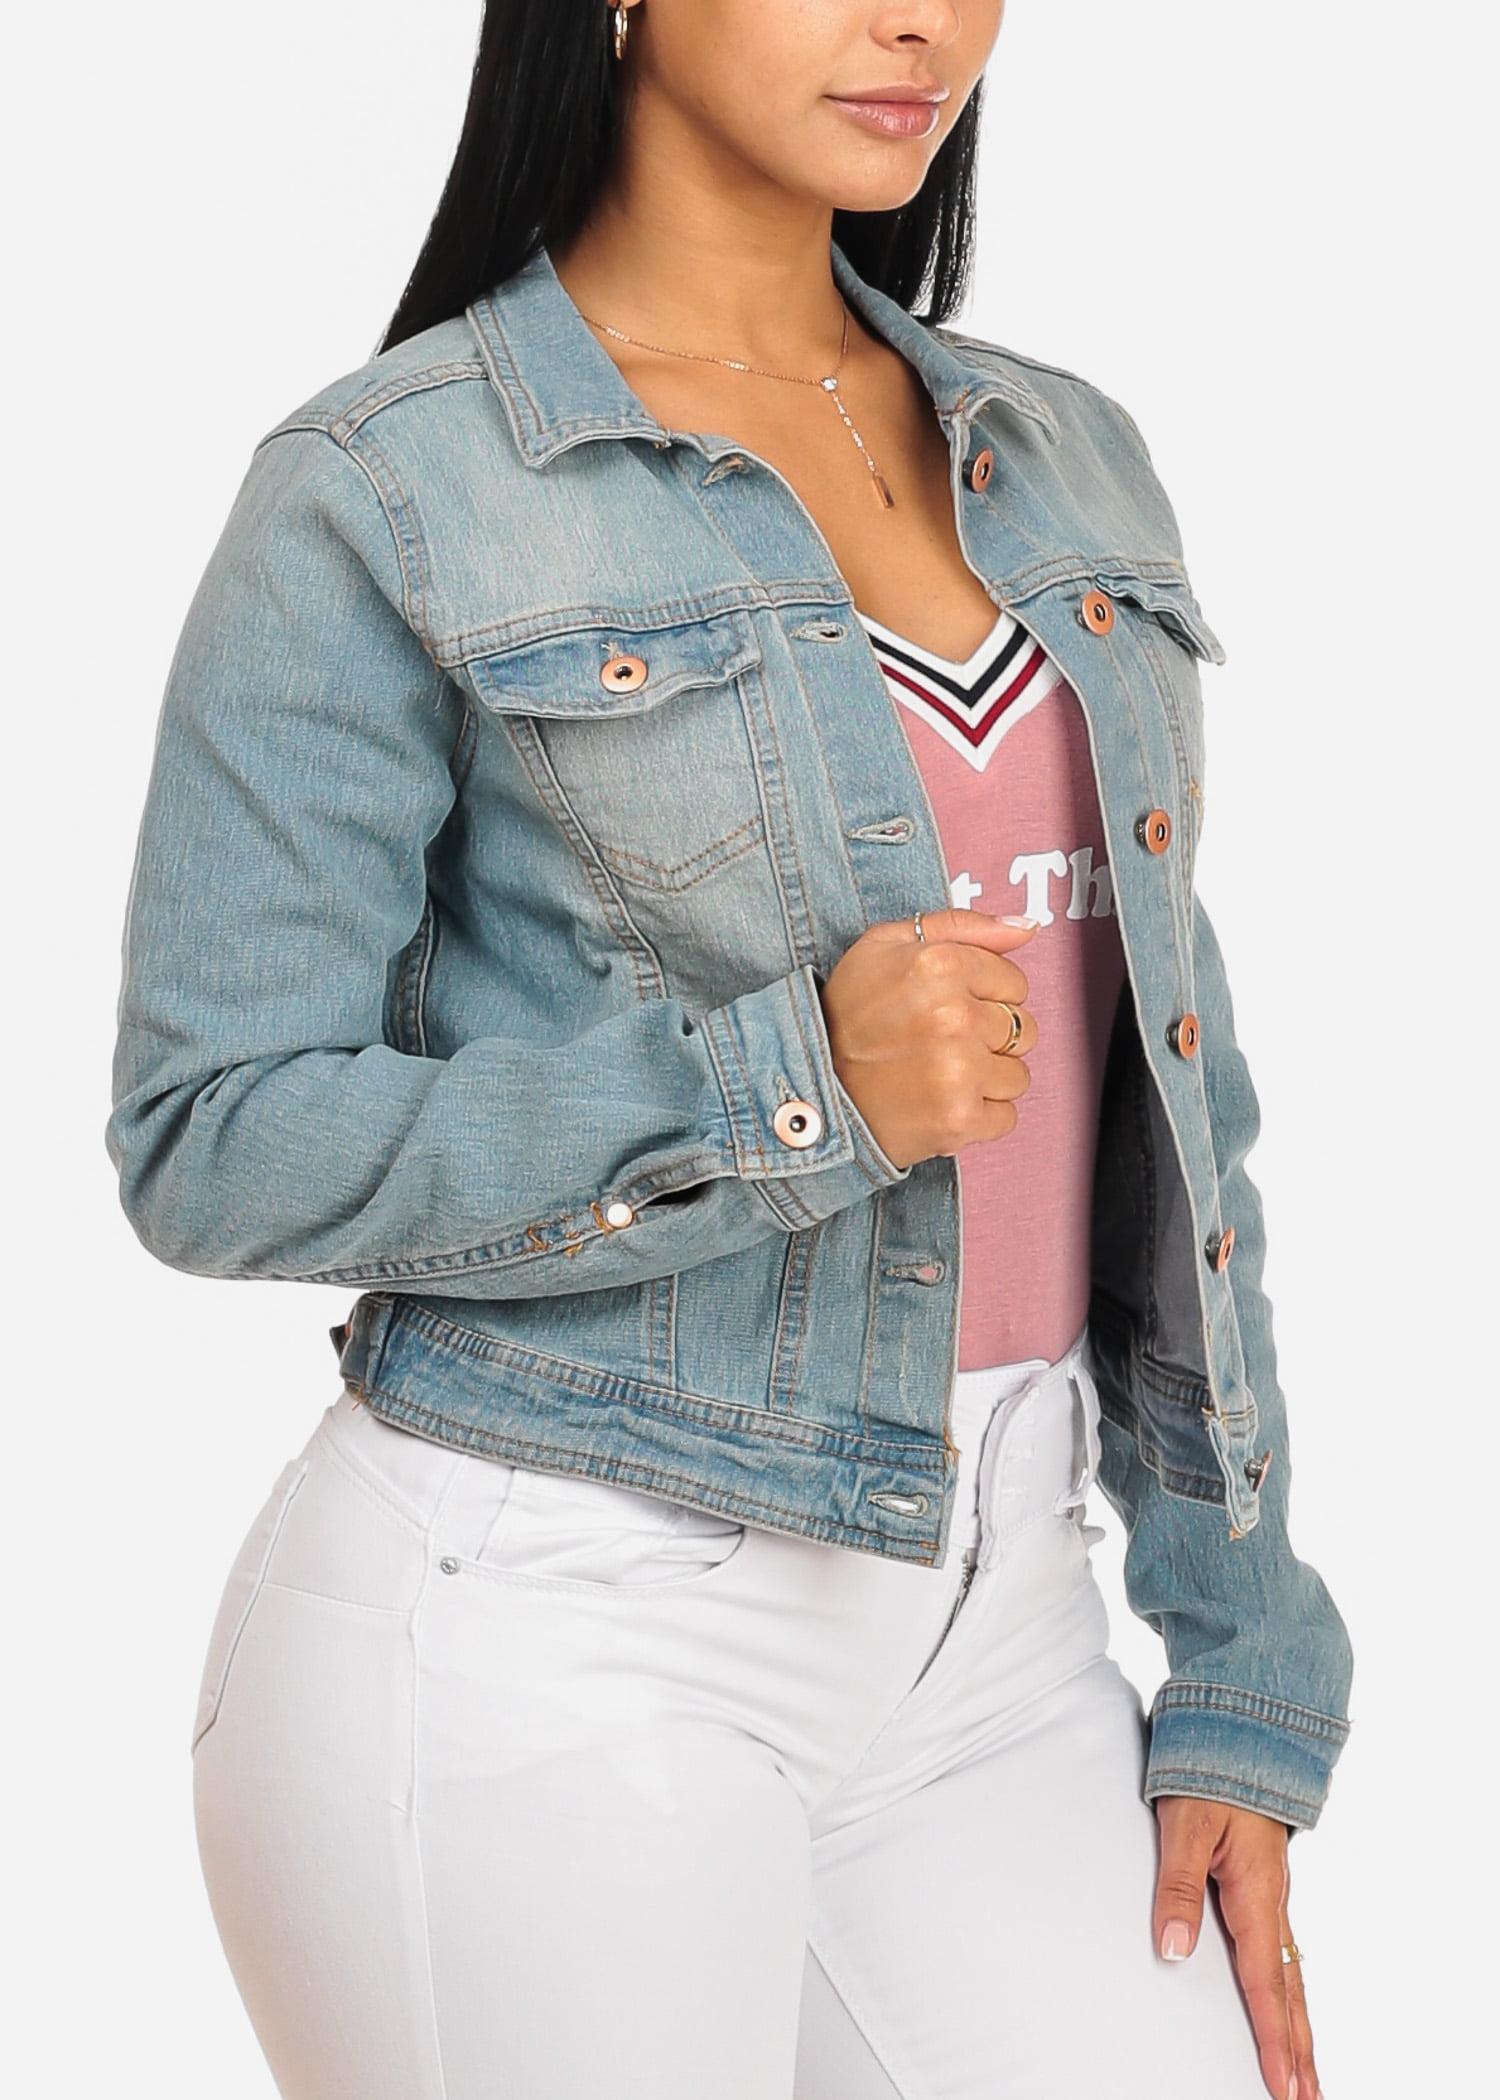 Womens Juniors Stylish Long Sleeve Button Up Light Wash Denim Jacket W 2 Top Pockets 41315P